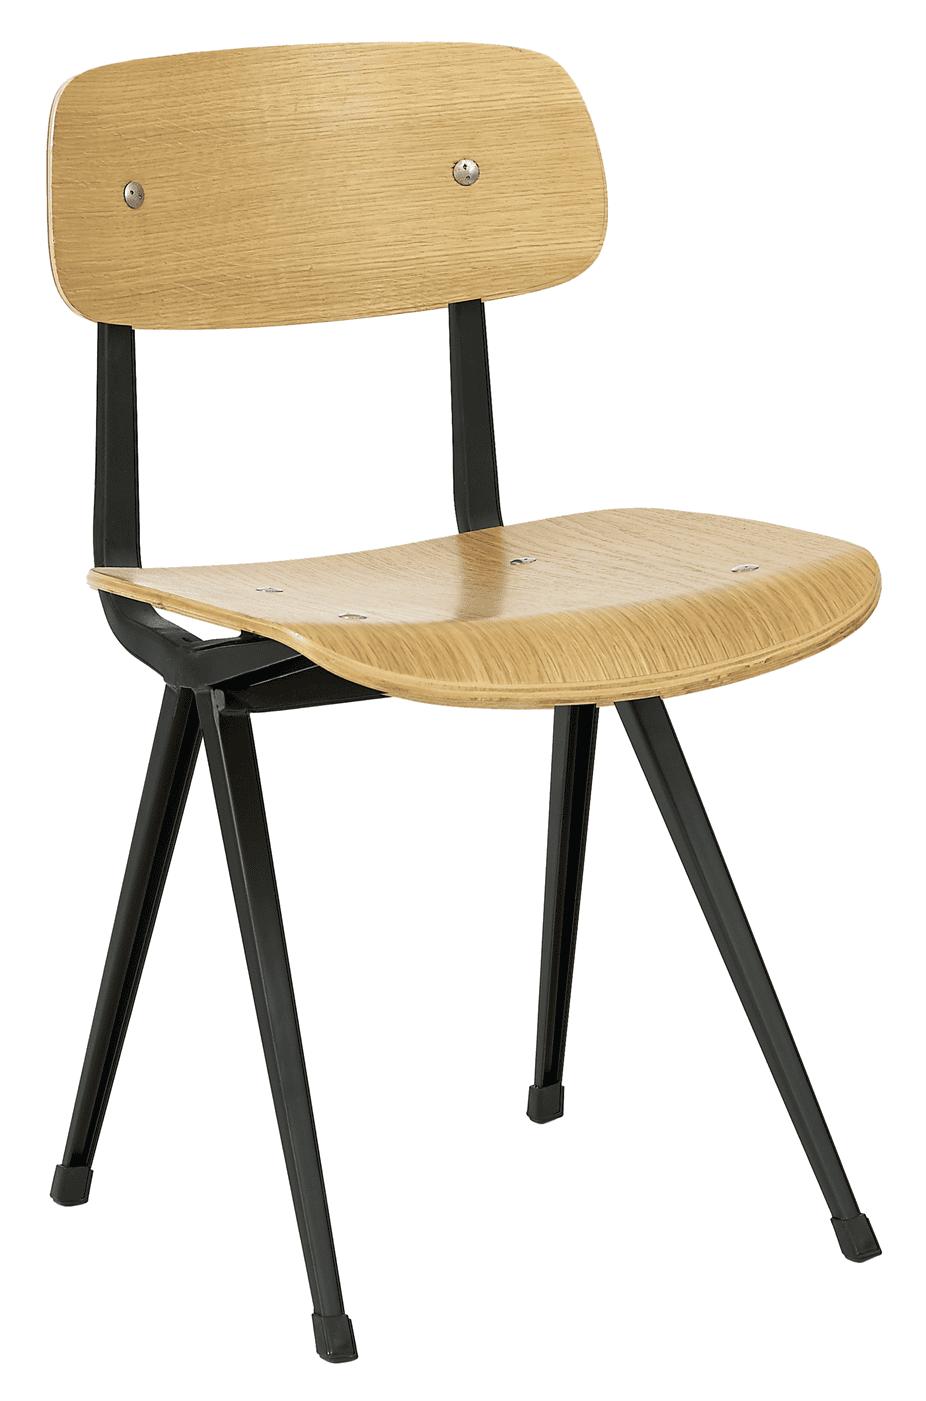 sc 1 st  BUK & Venturi side chair